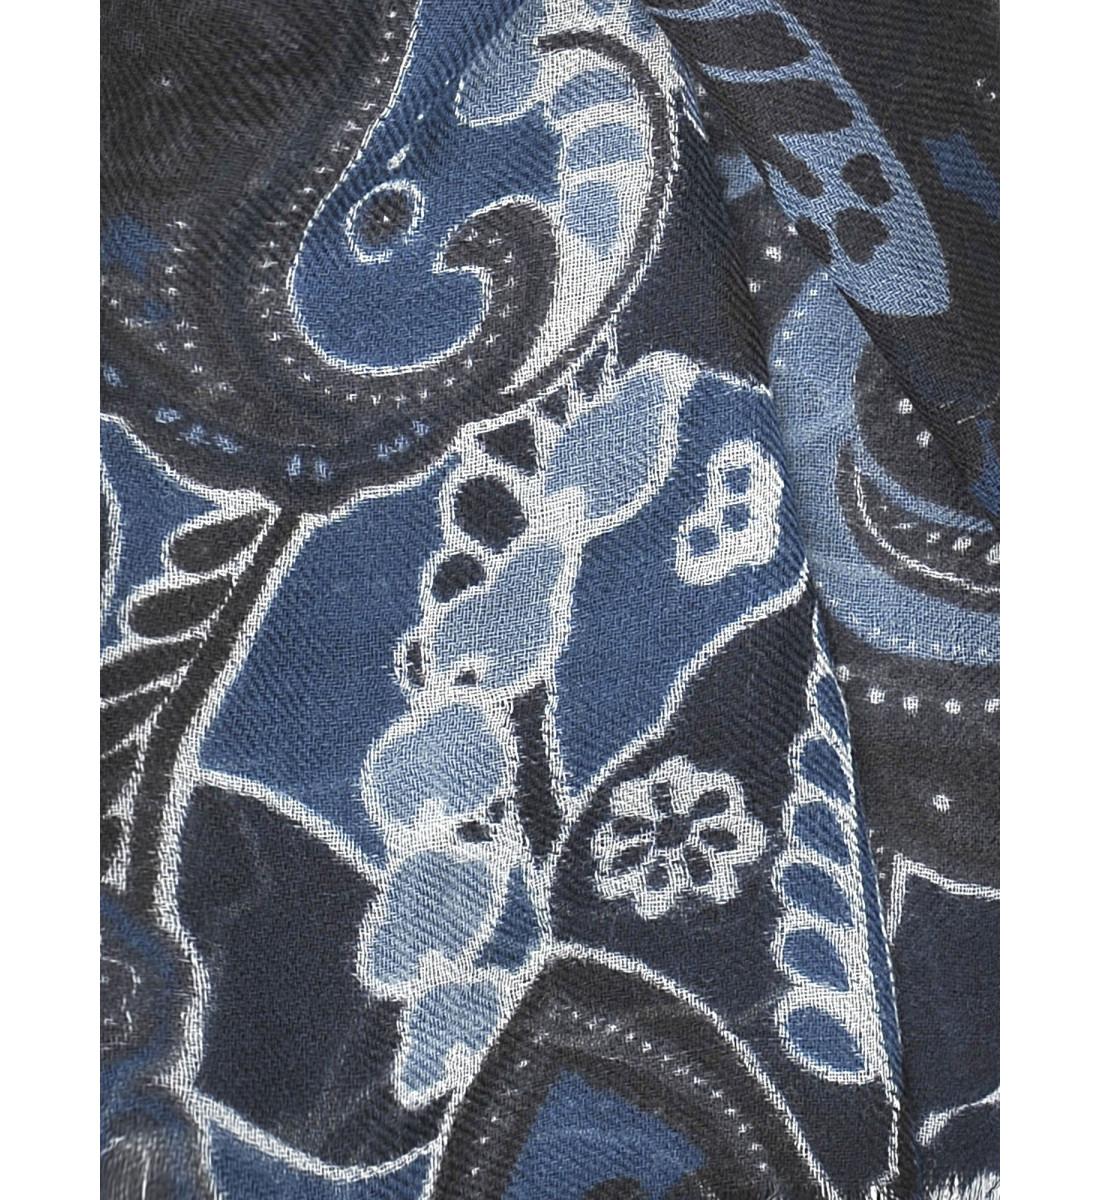 Echarpe fantaisie imprimé floral MARINE/GRIS